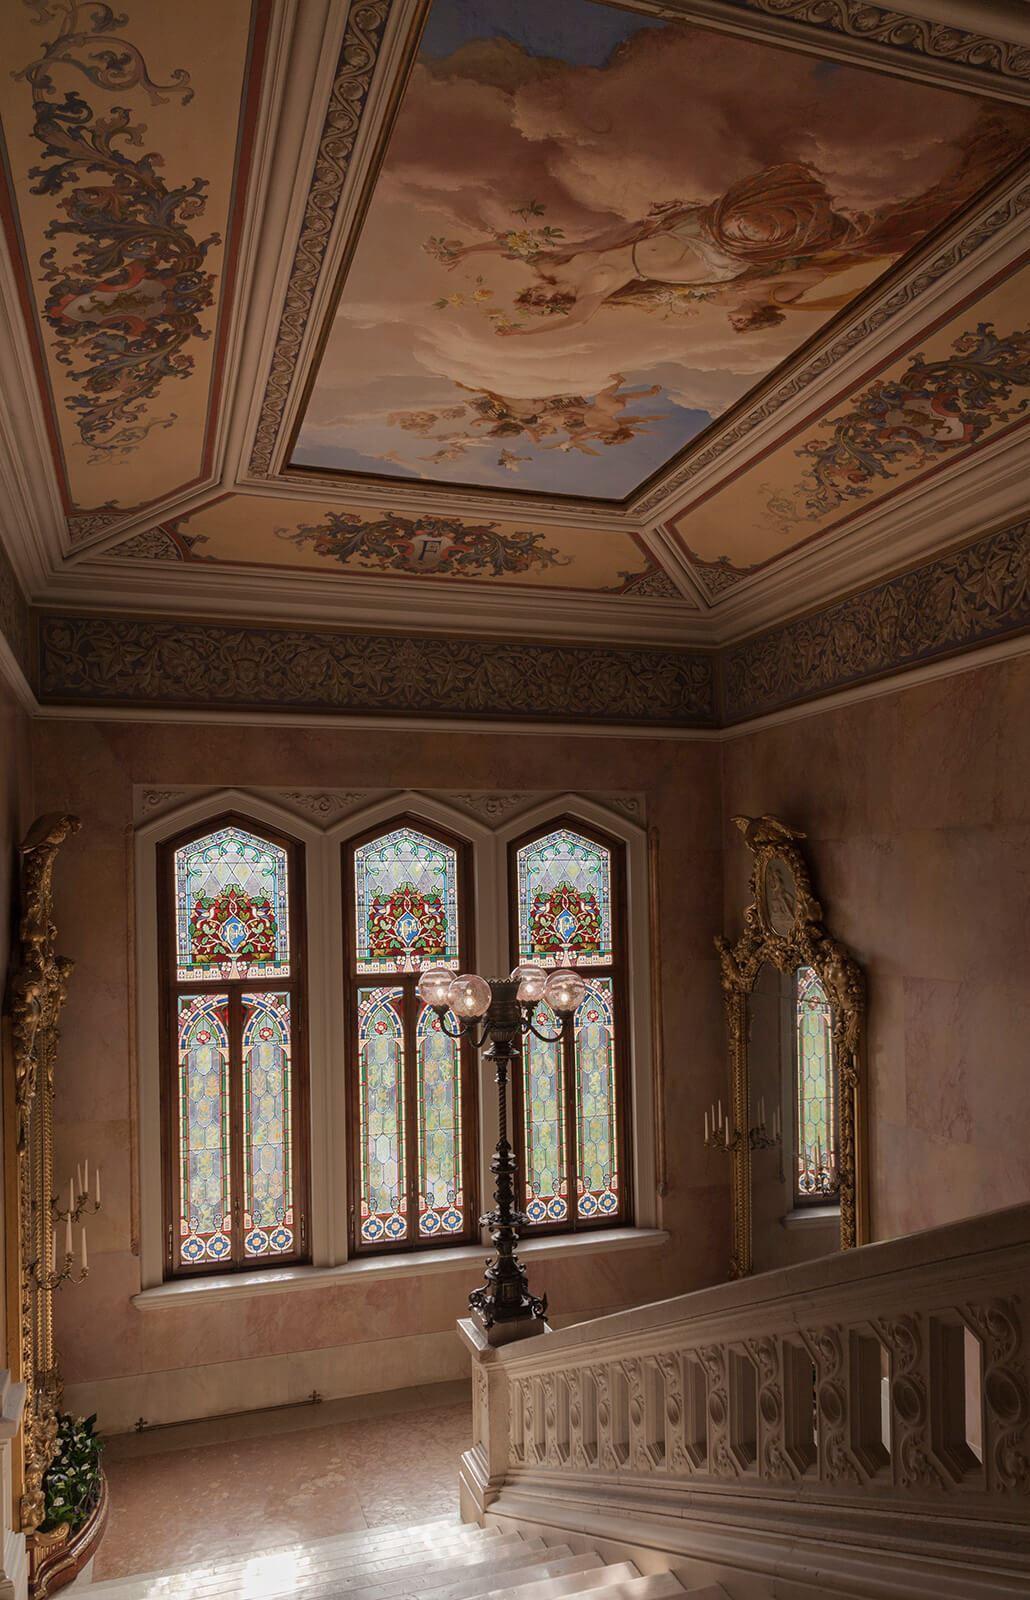 Grand Hotel a Villa Feltrinelli - The marble stairways